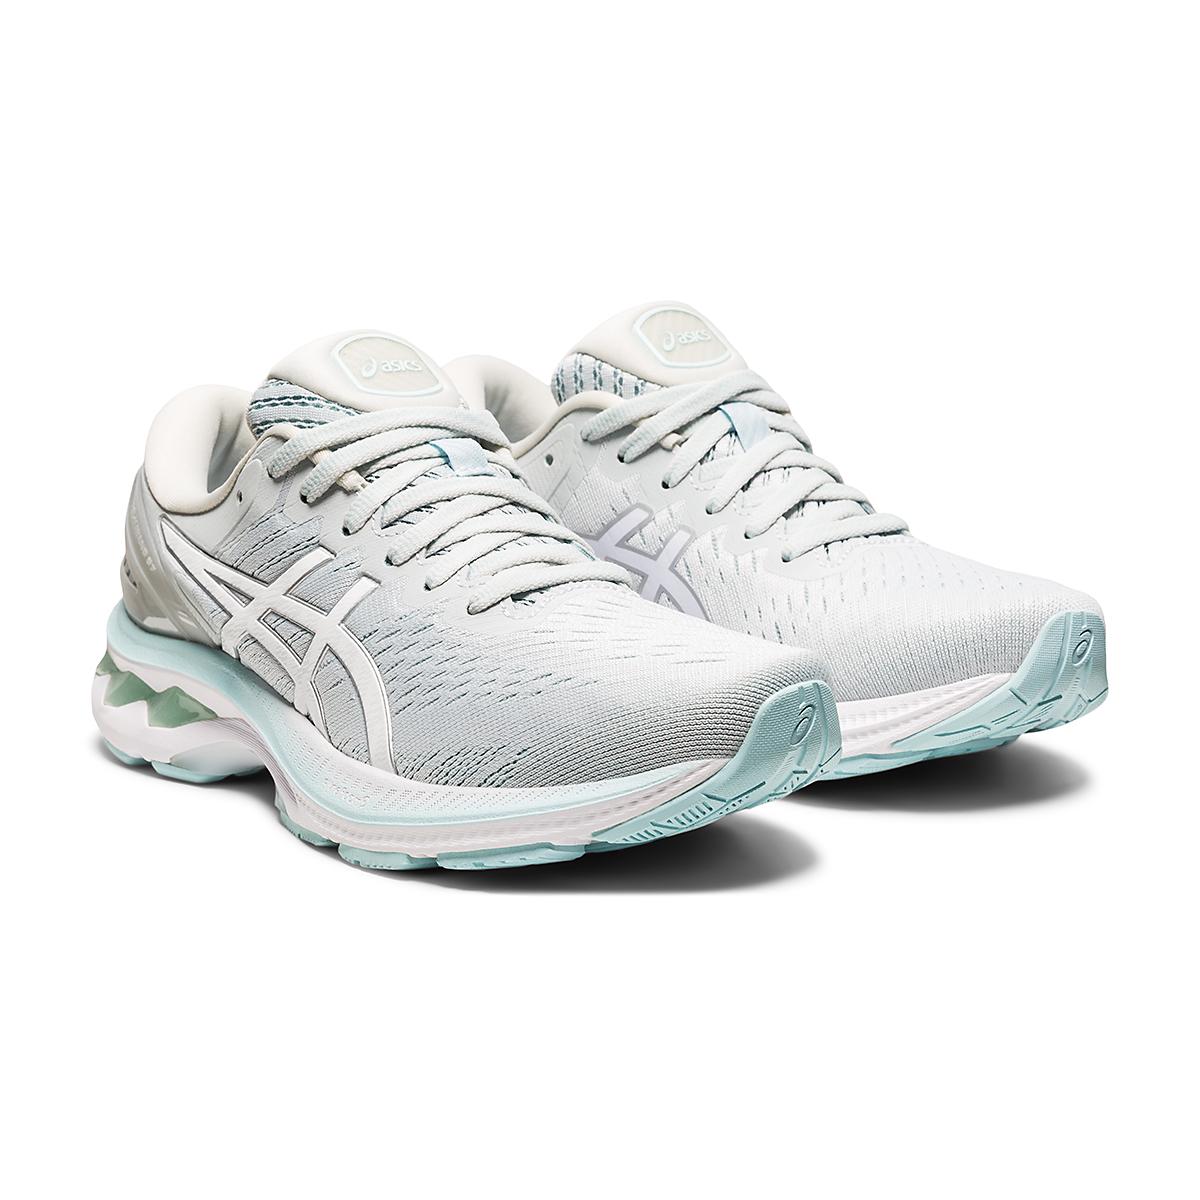 Women's Asics GEL-Kayano 27 Running Shoe - Color: Glacier Grey/White - Size: 6 - Width: Regular, Glacier Grey/White, large, image 3